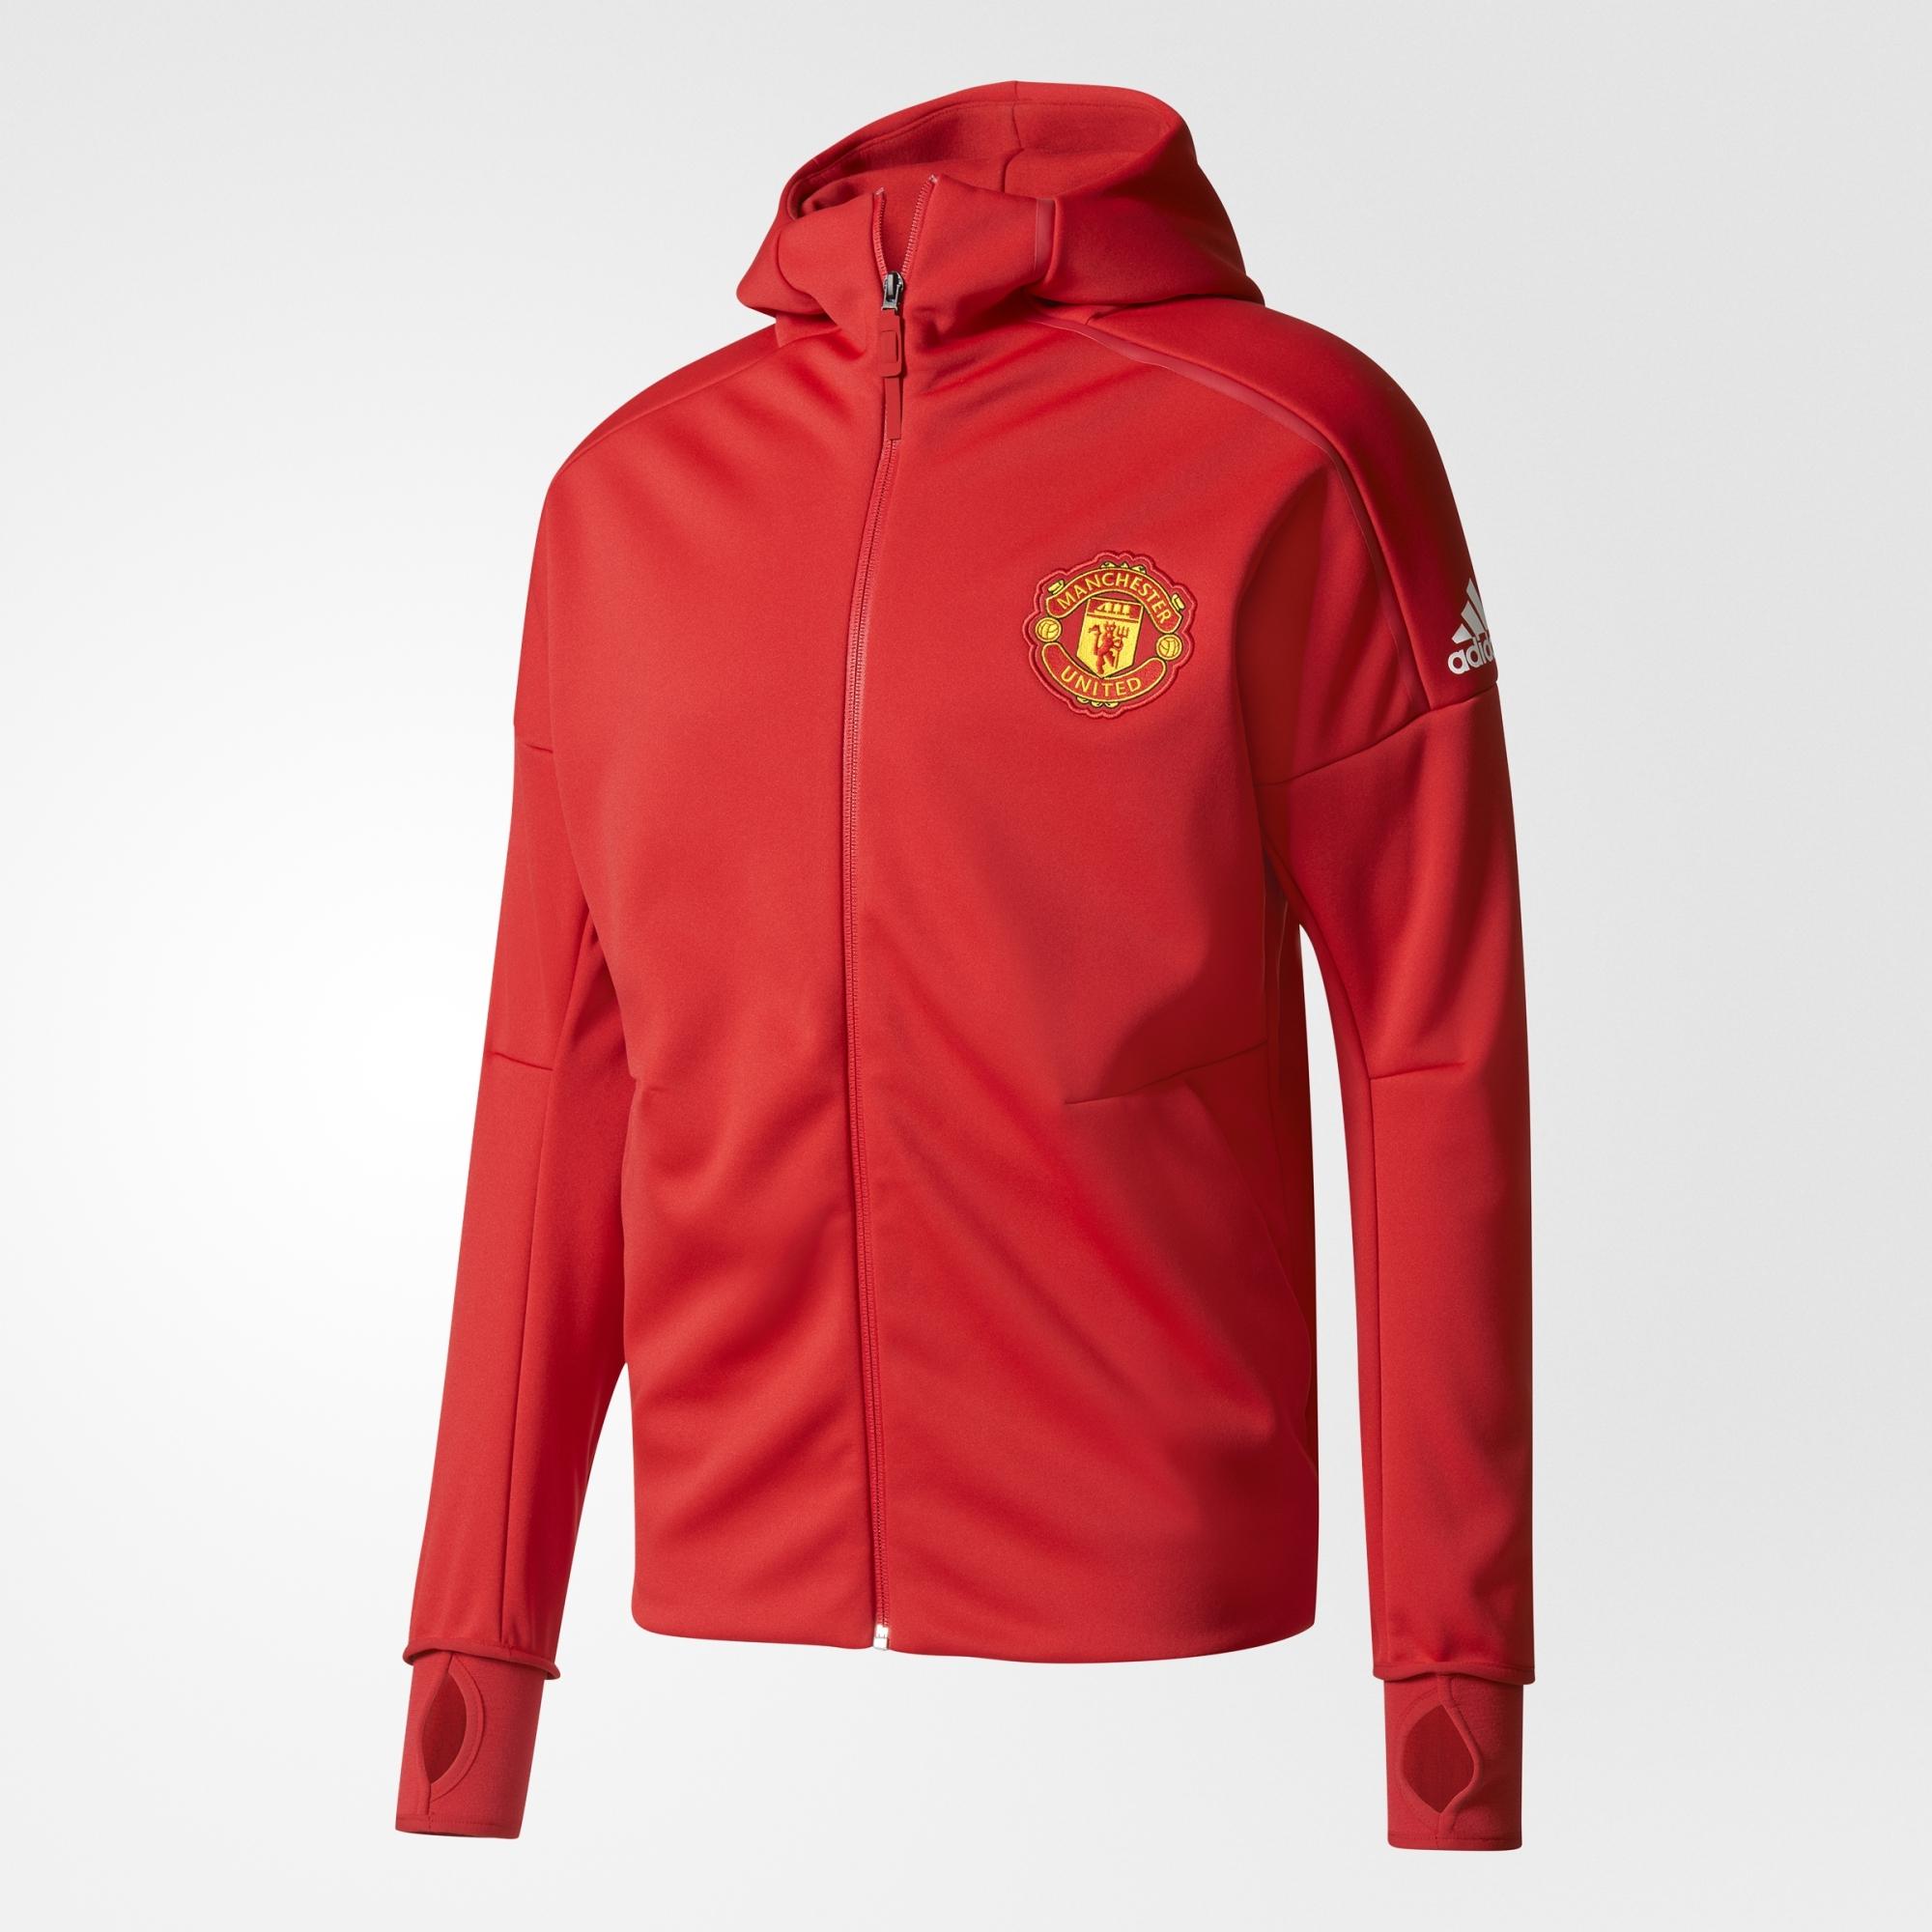 reputable site 9c117 d2c11 Man Utd Adidas Shirt Deal